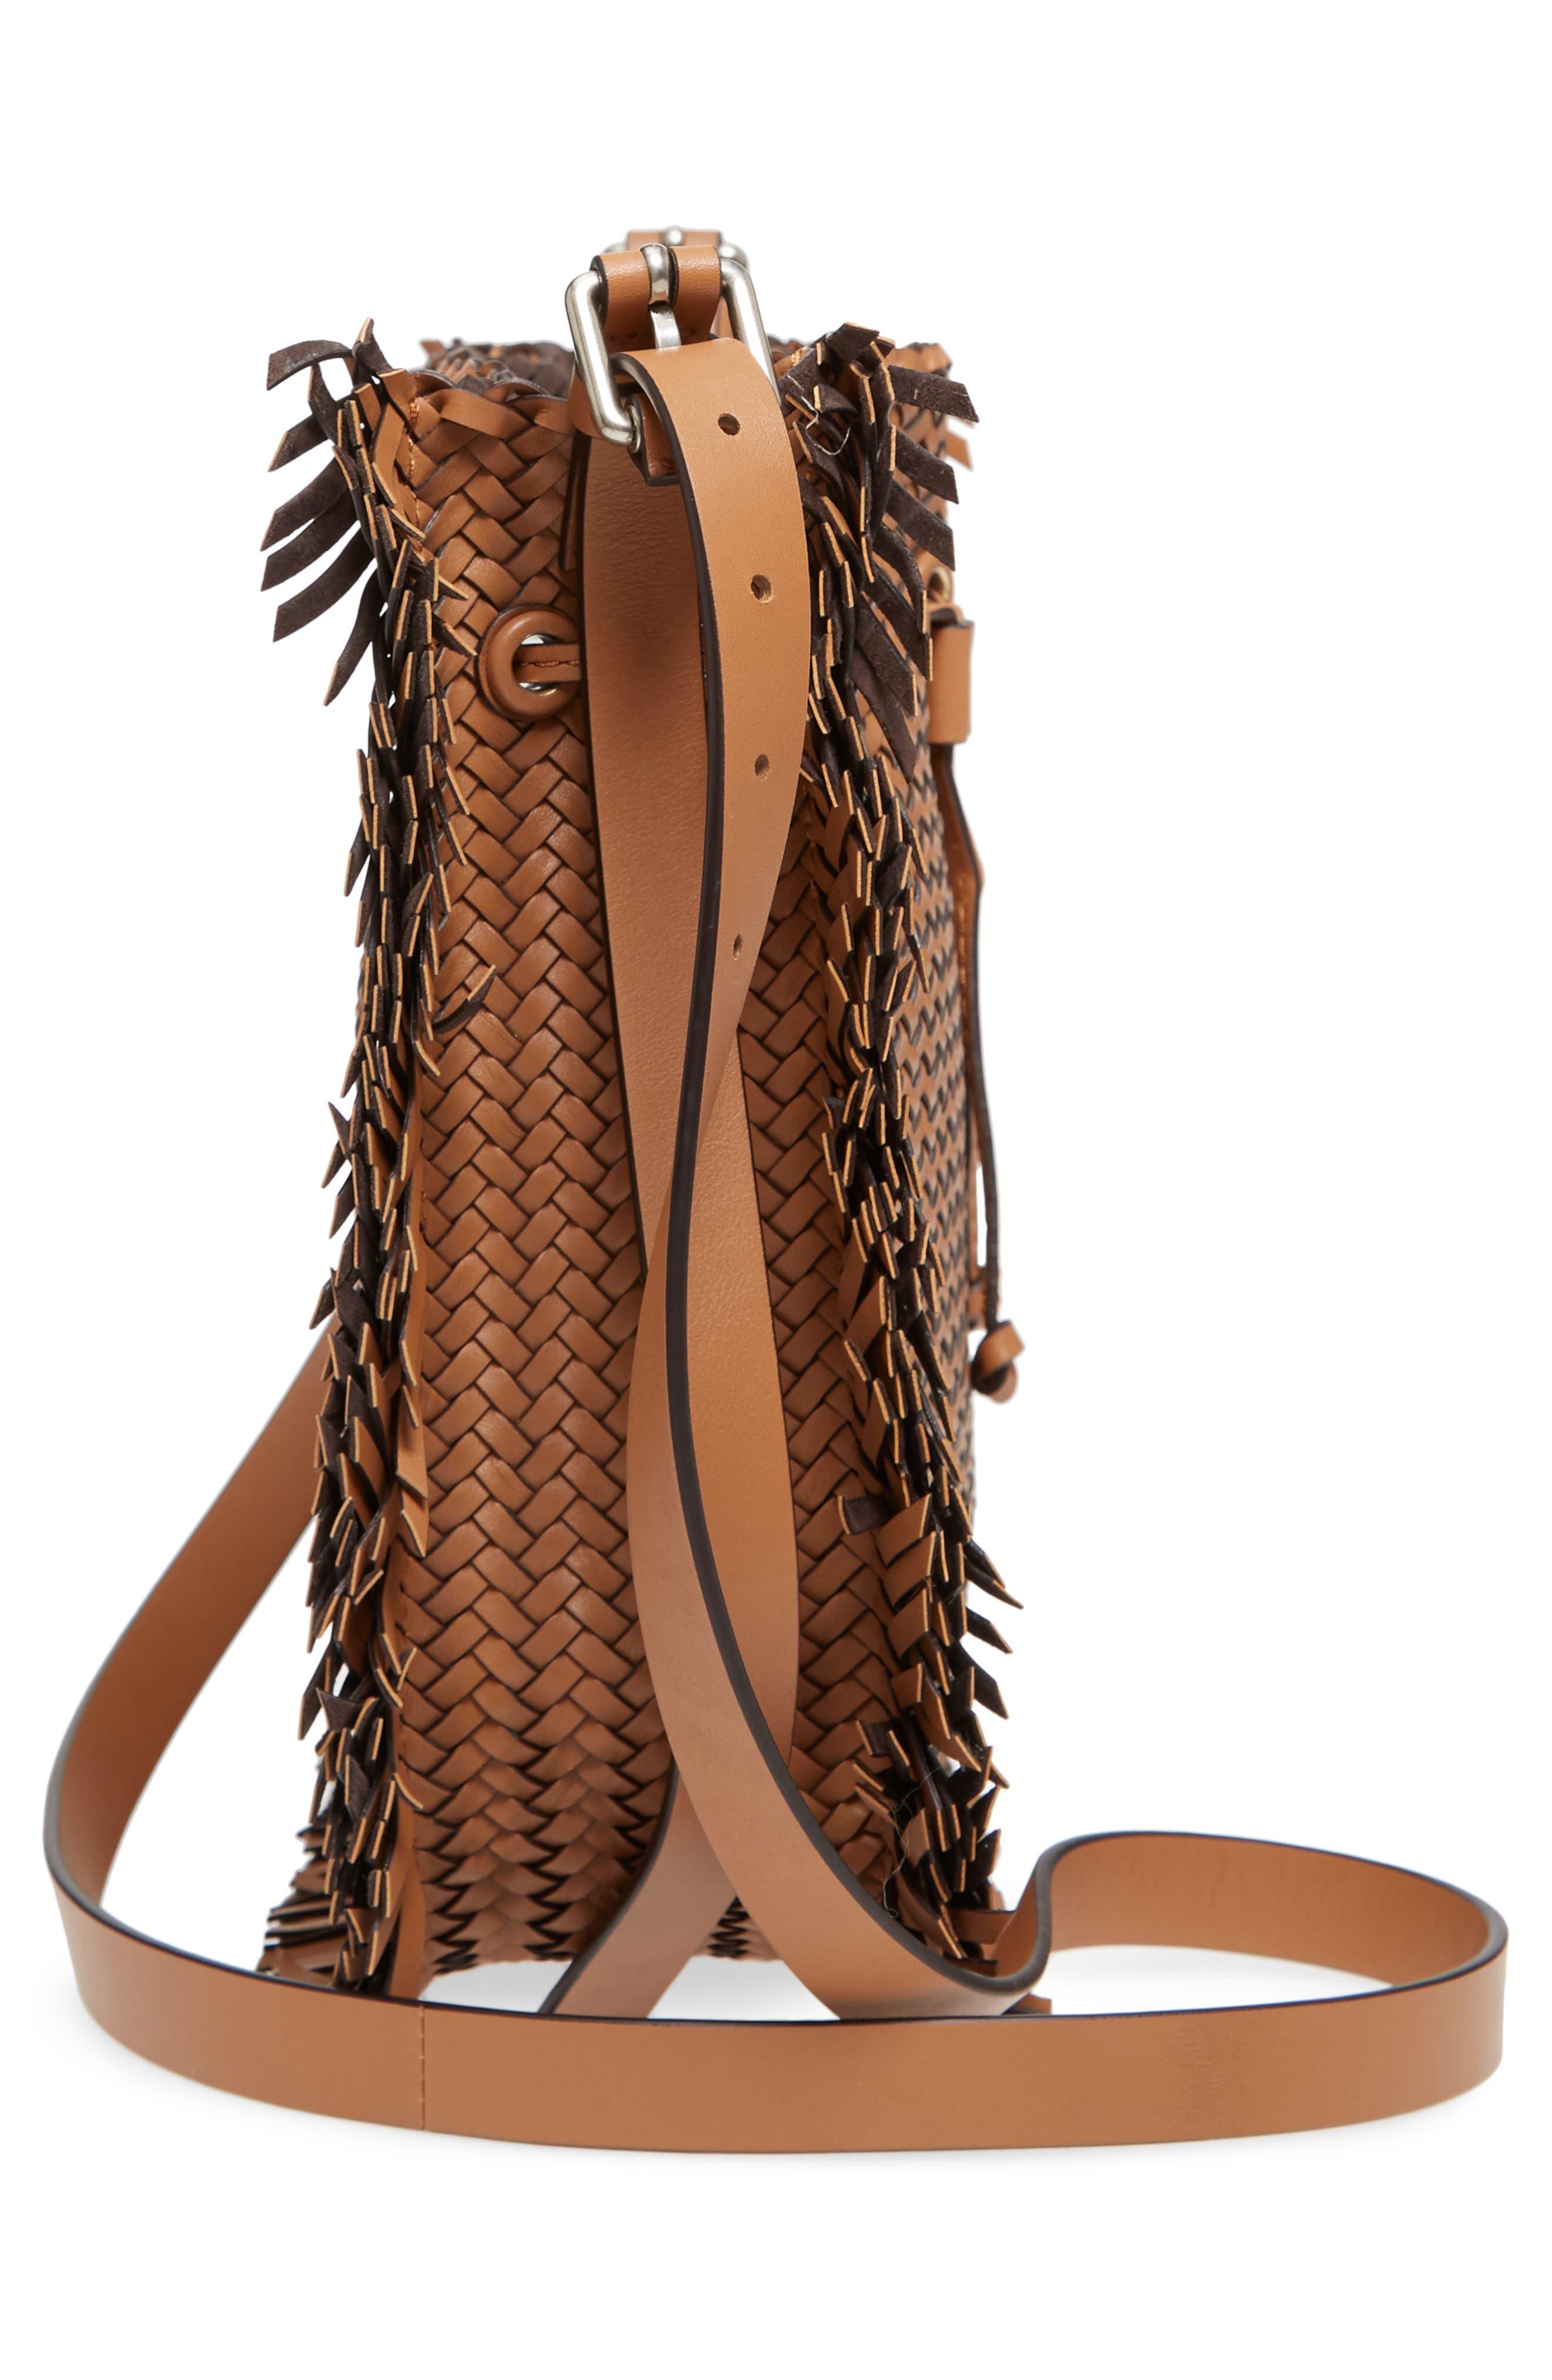 Maldives Woven Frayed Leather Crossbody Bag,                             Alternate thumbnail 5, color,                             231